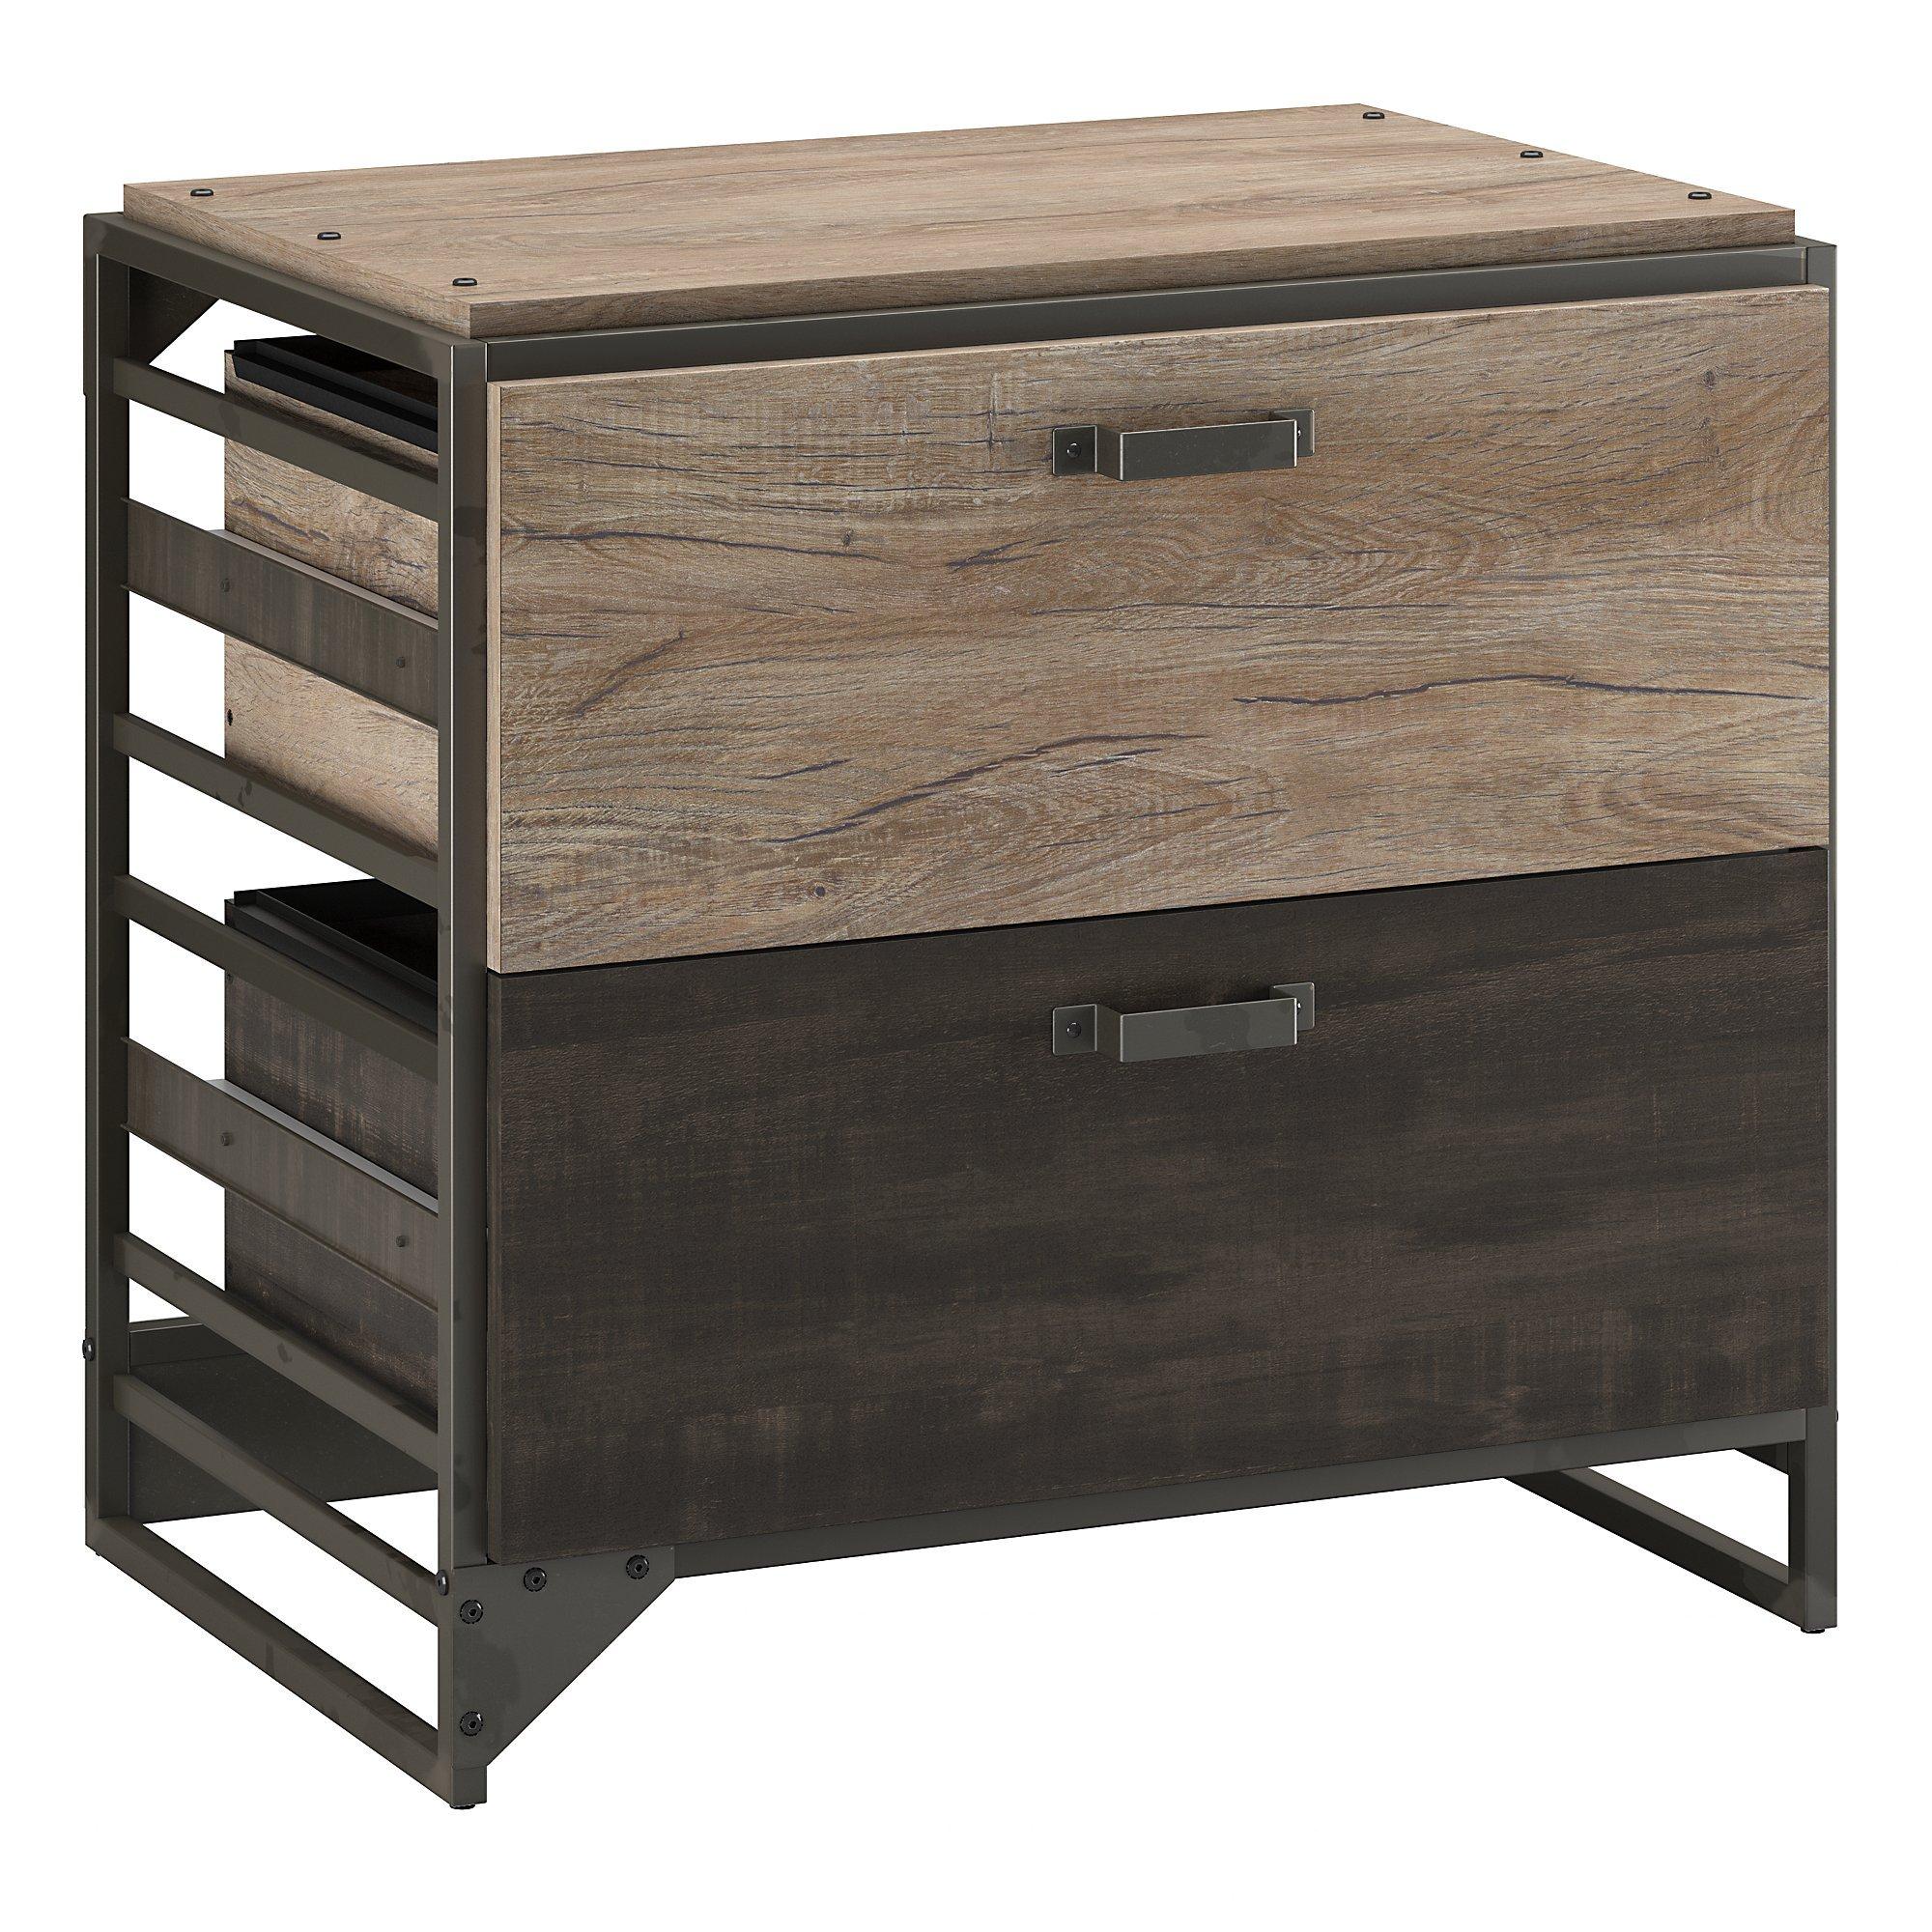 Bush Furniture Refinery Lateral File Cabinet in Rustic Gray